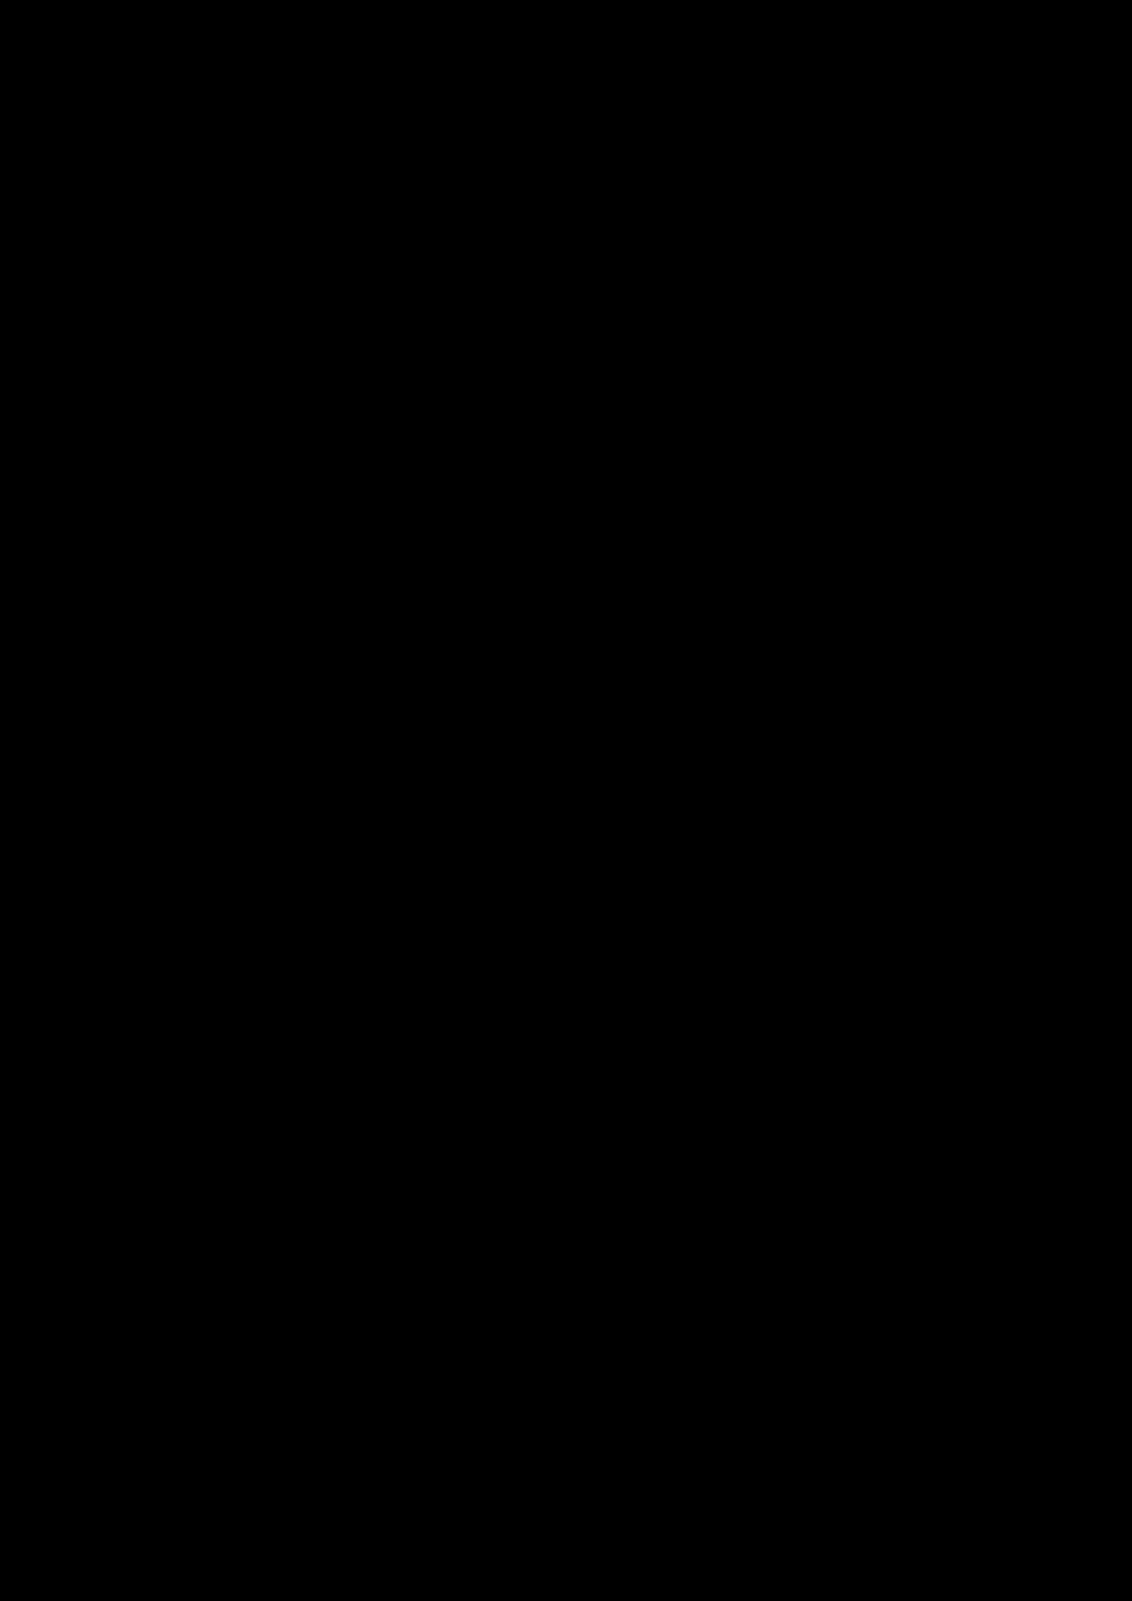 Korolevstvo slez slide, Image 30